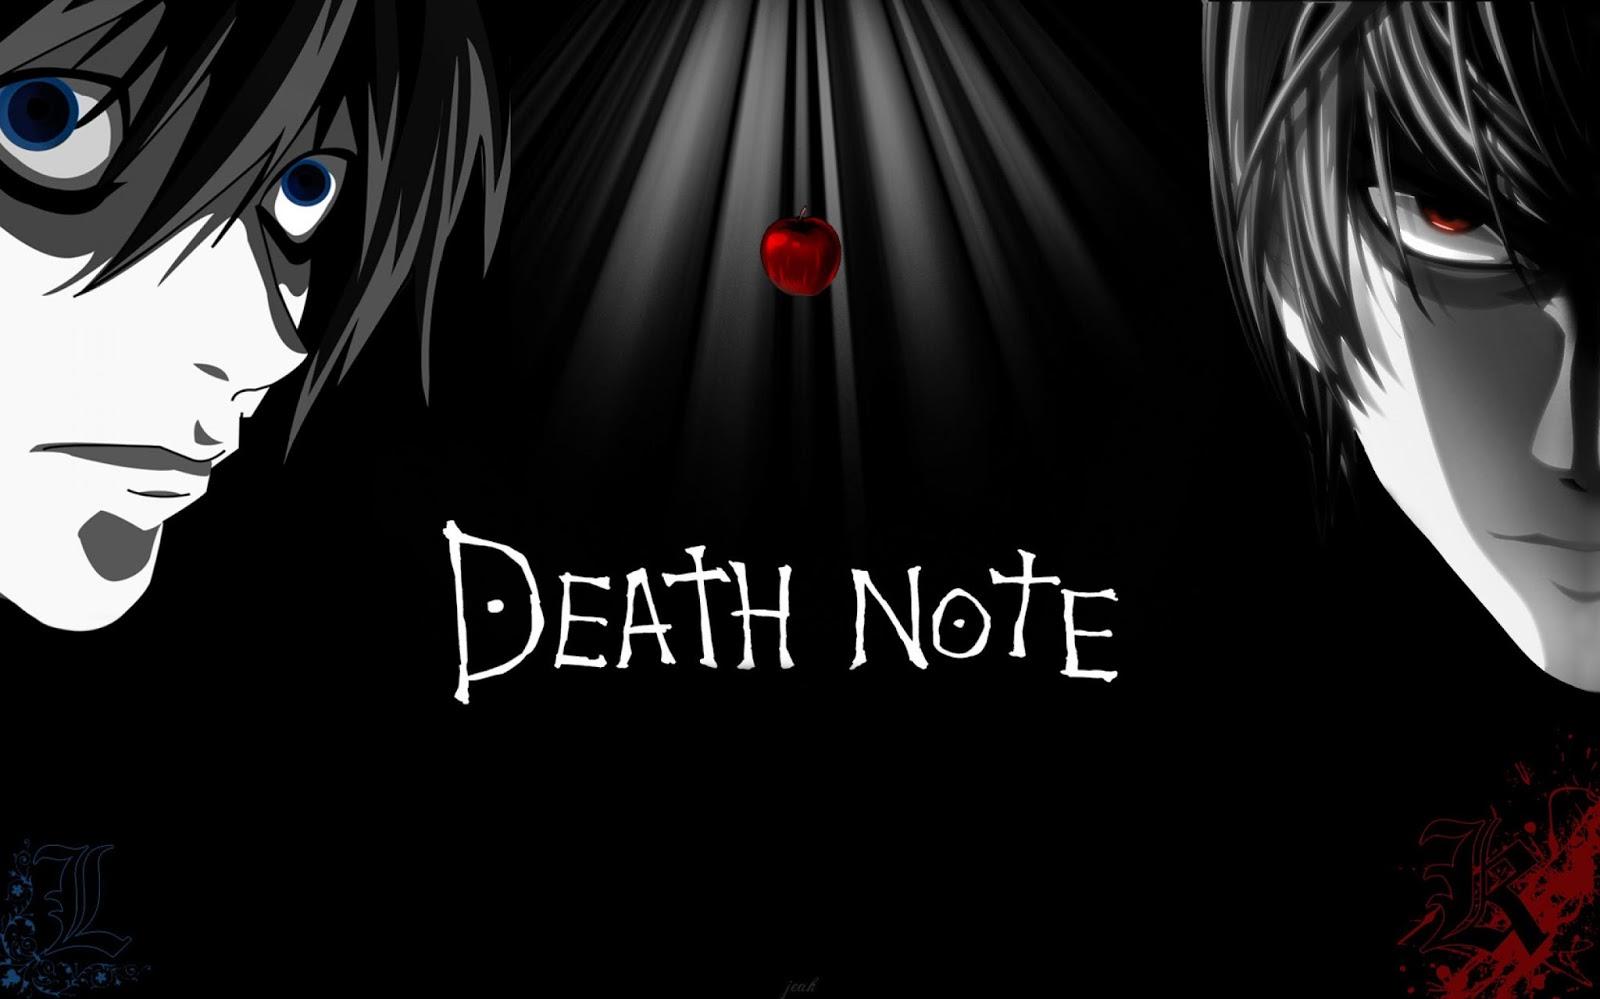 Live action death note primera impresi n chica otaku Primera impresion